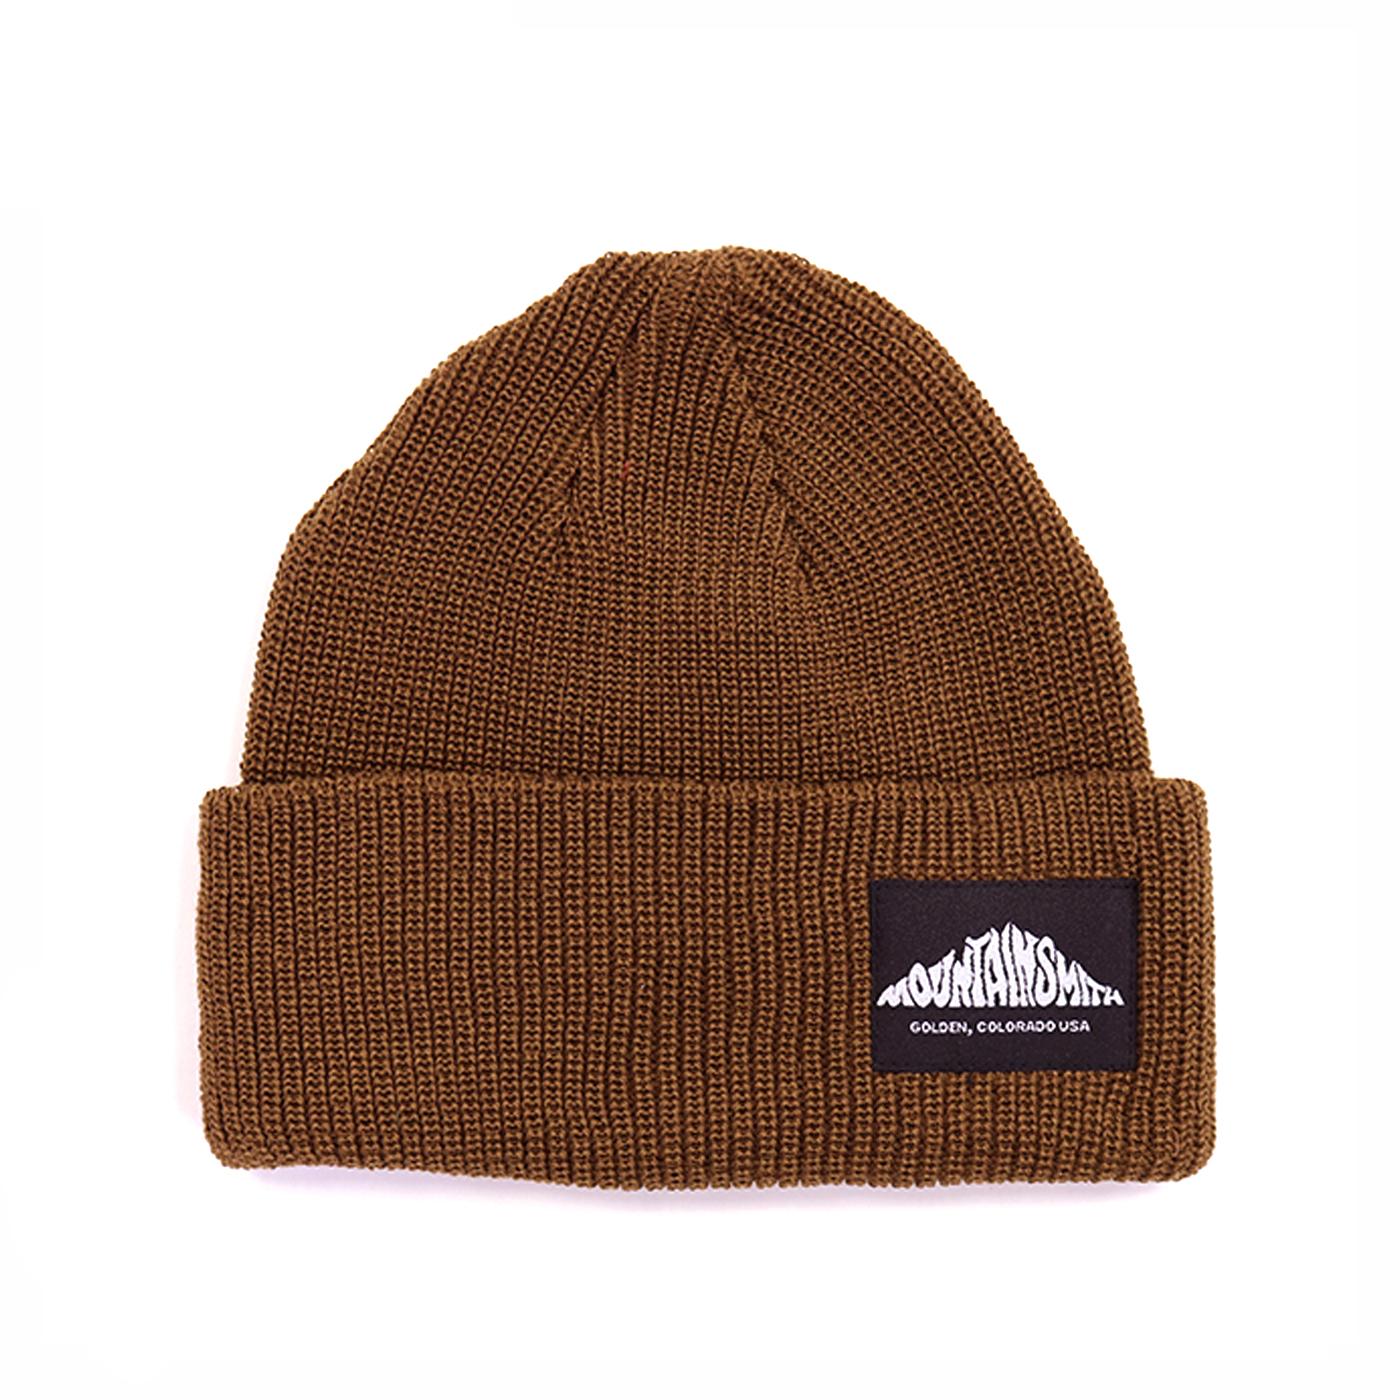 product: LOGO KNIT CAP / color: BROWN 1